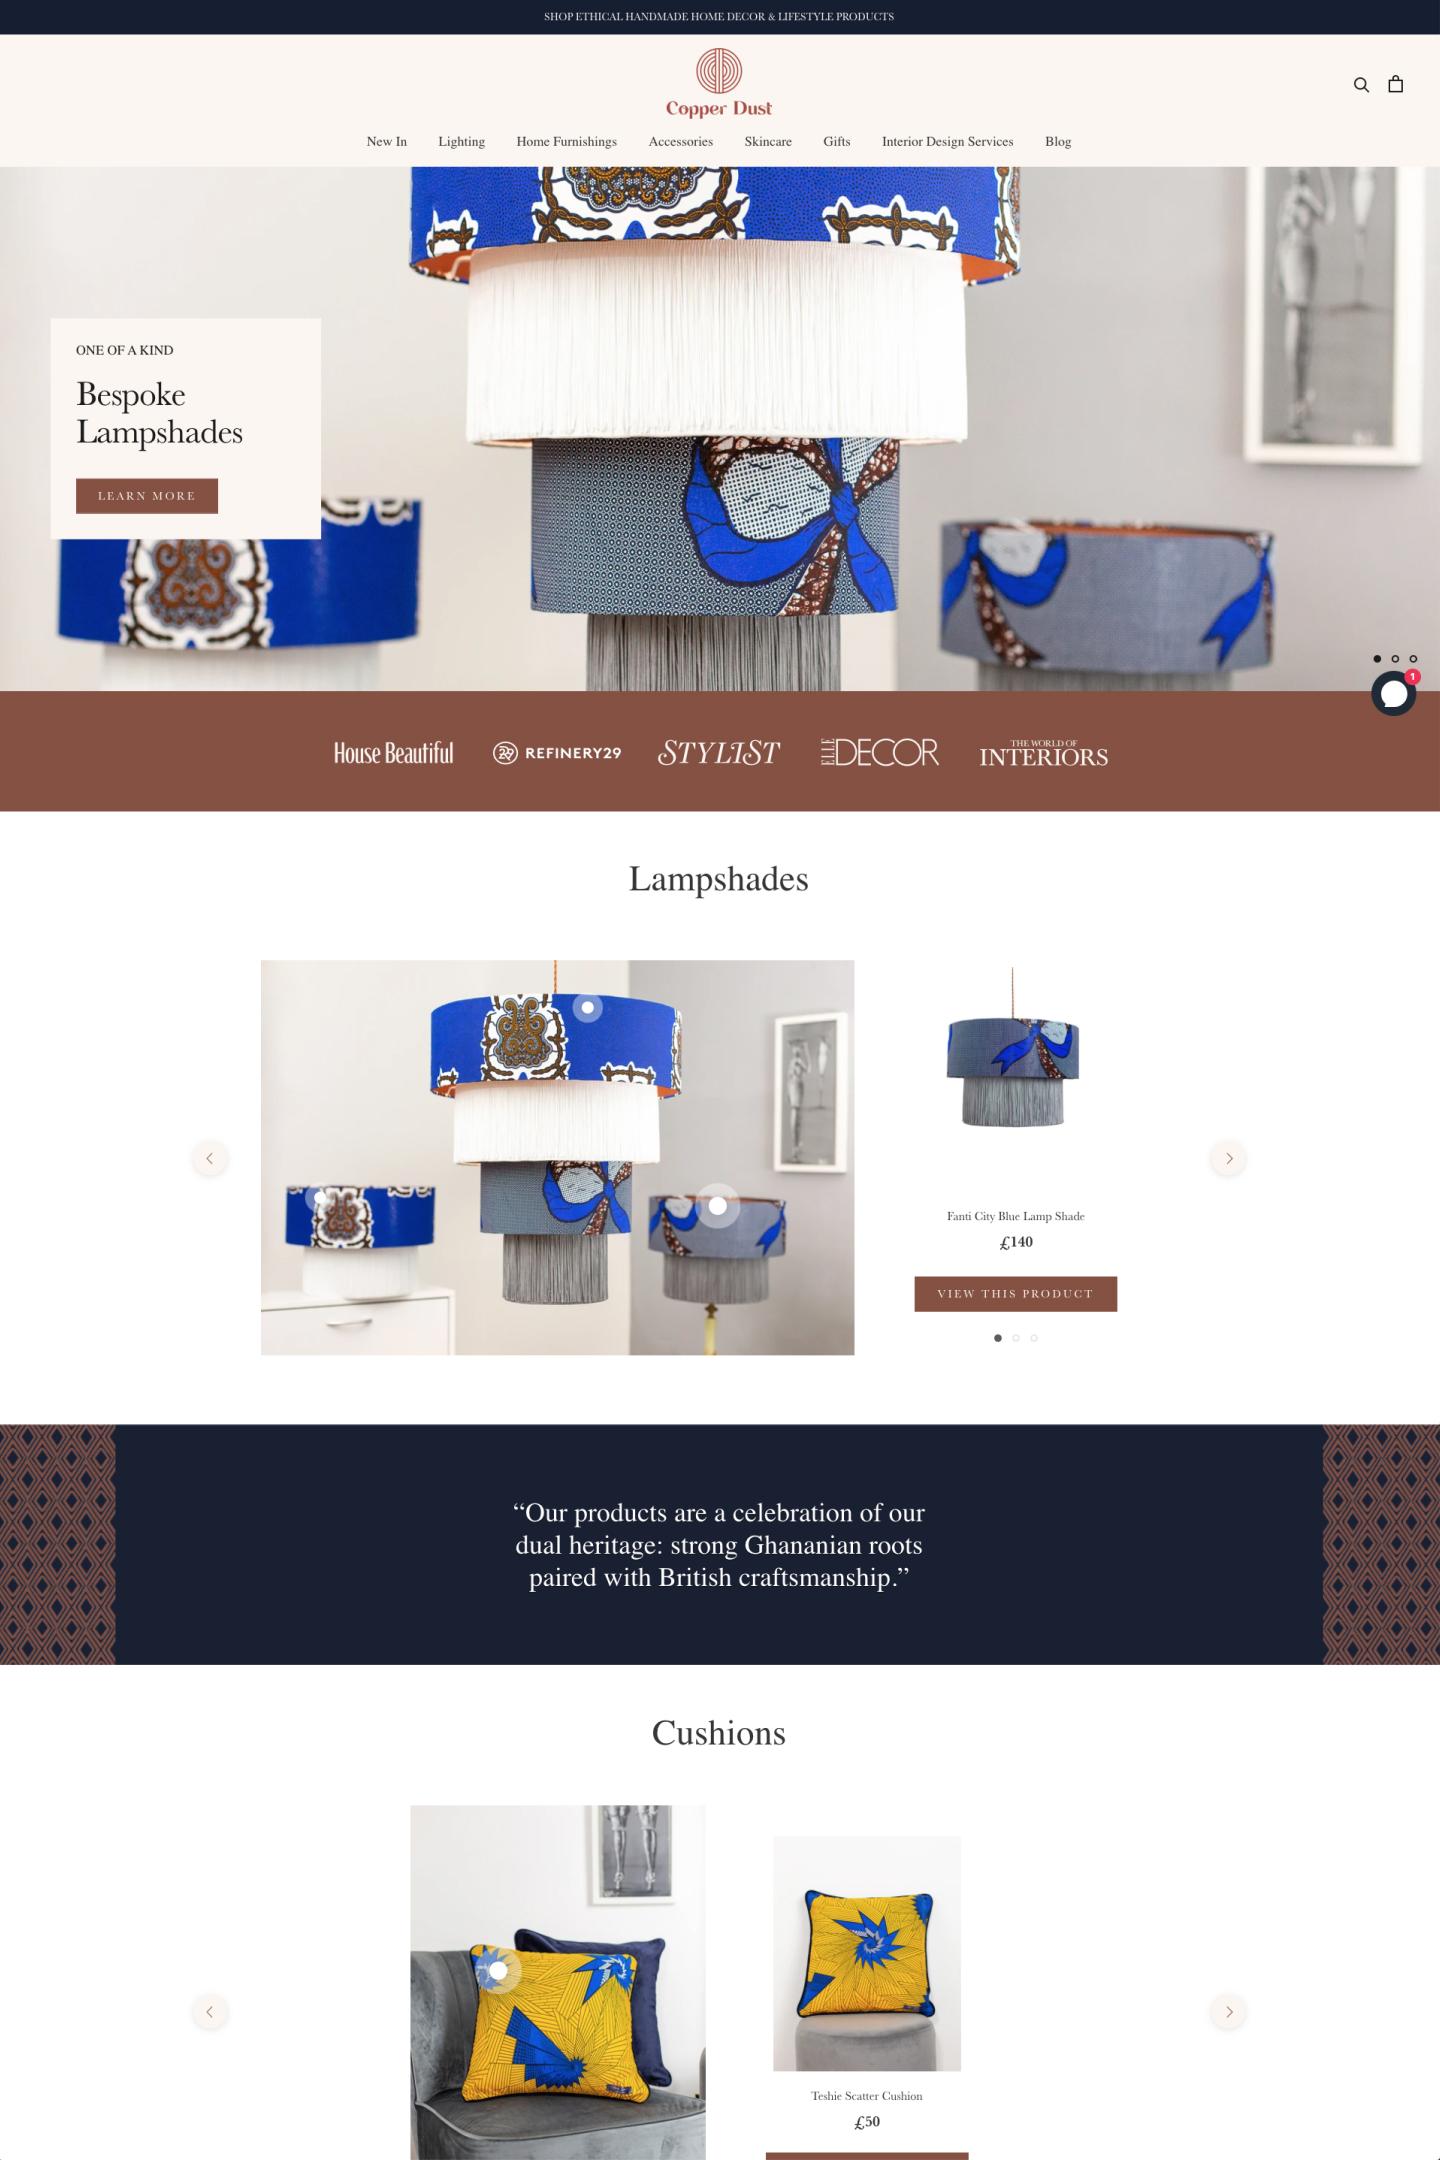 Copper Dust London - Lifestyle Brand Ecommerce